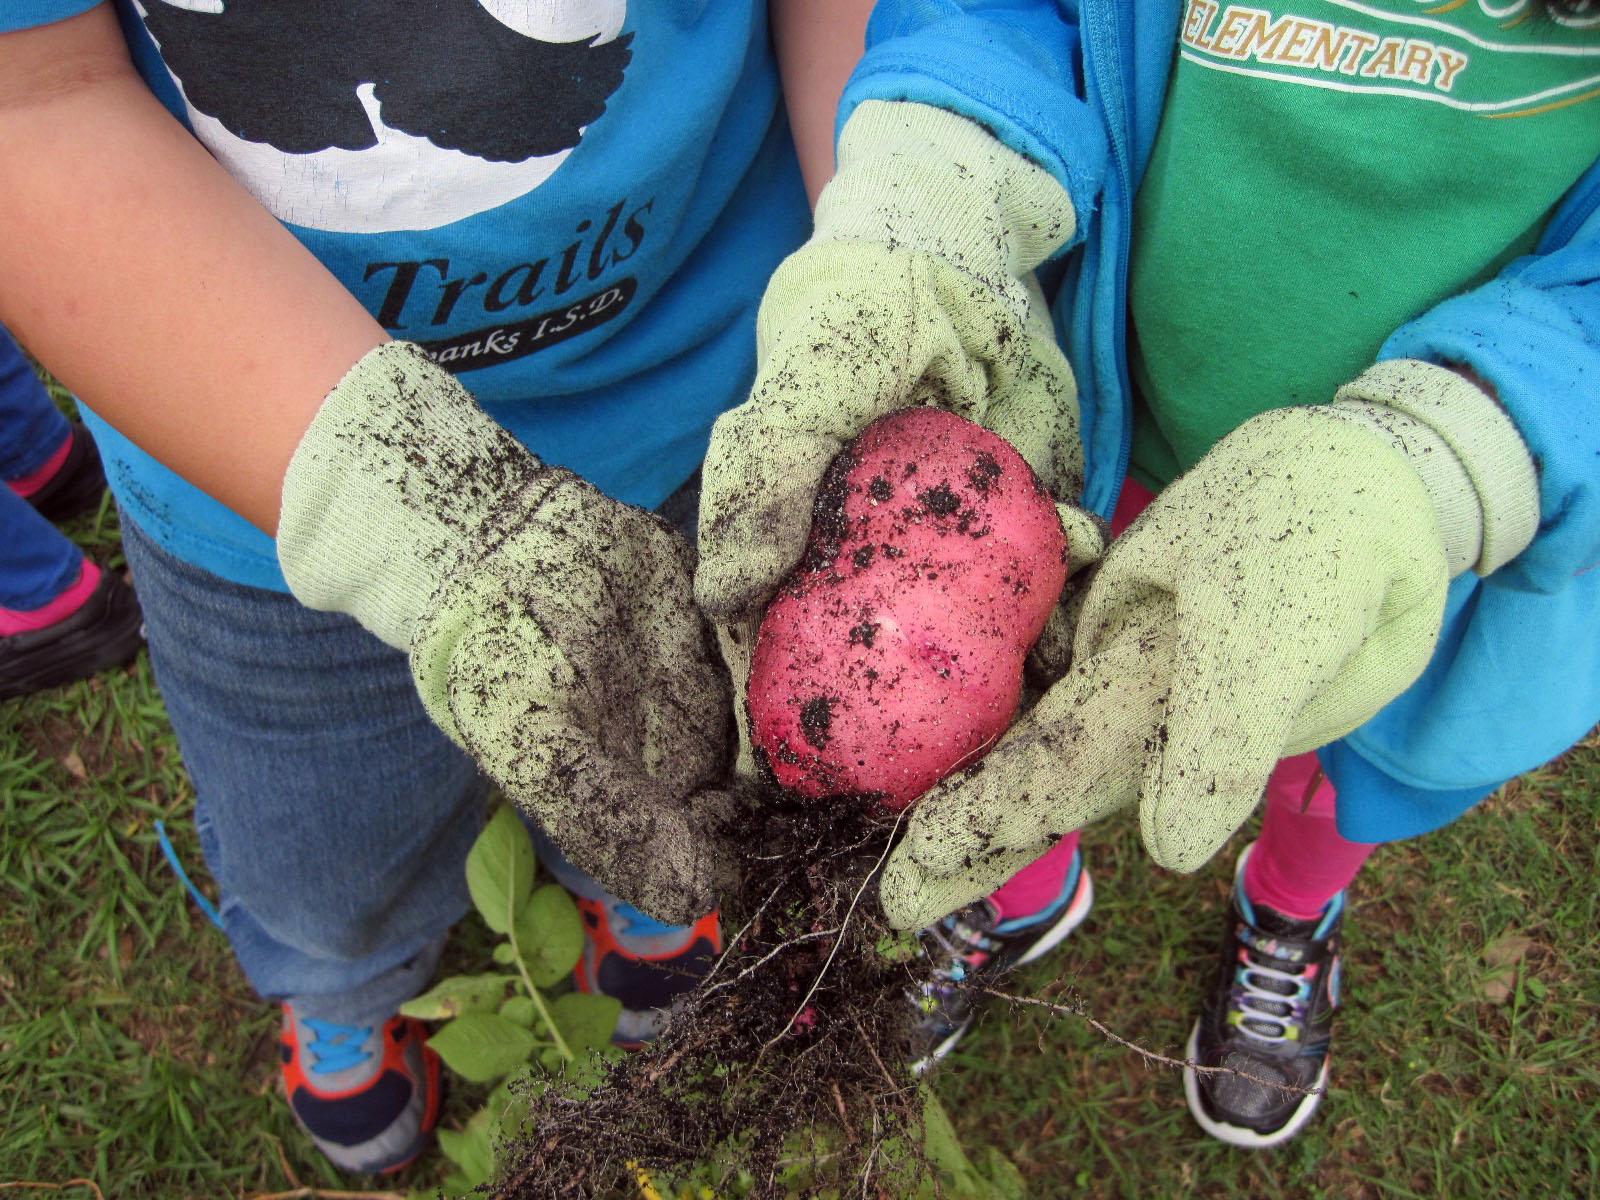 At Bang Elementary, red potato harvest